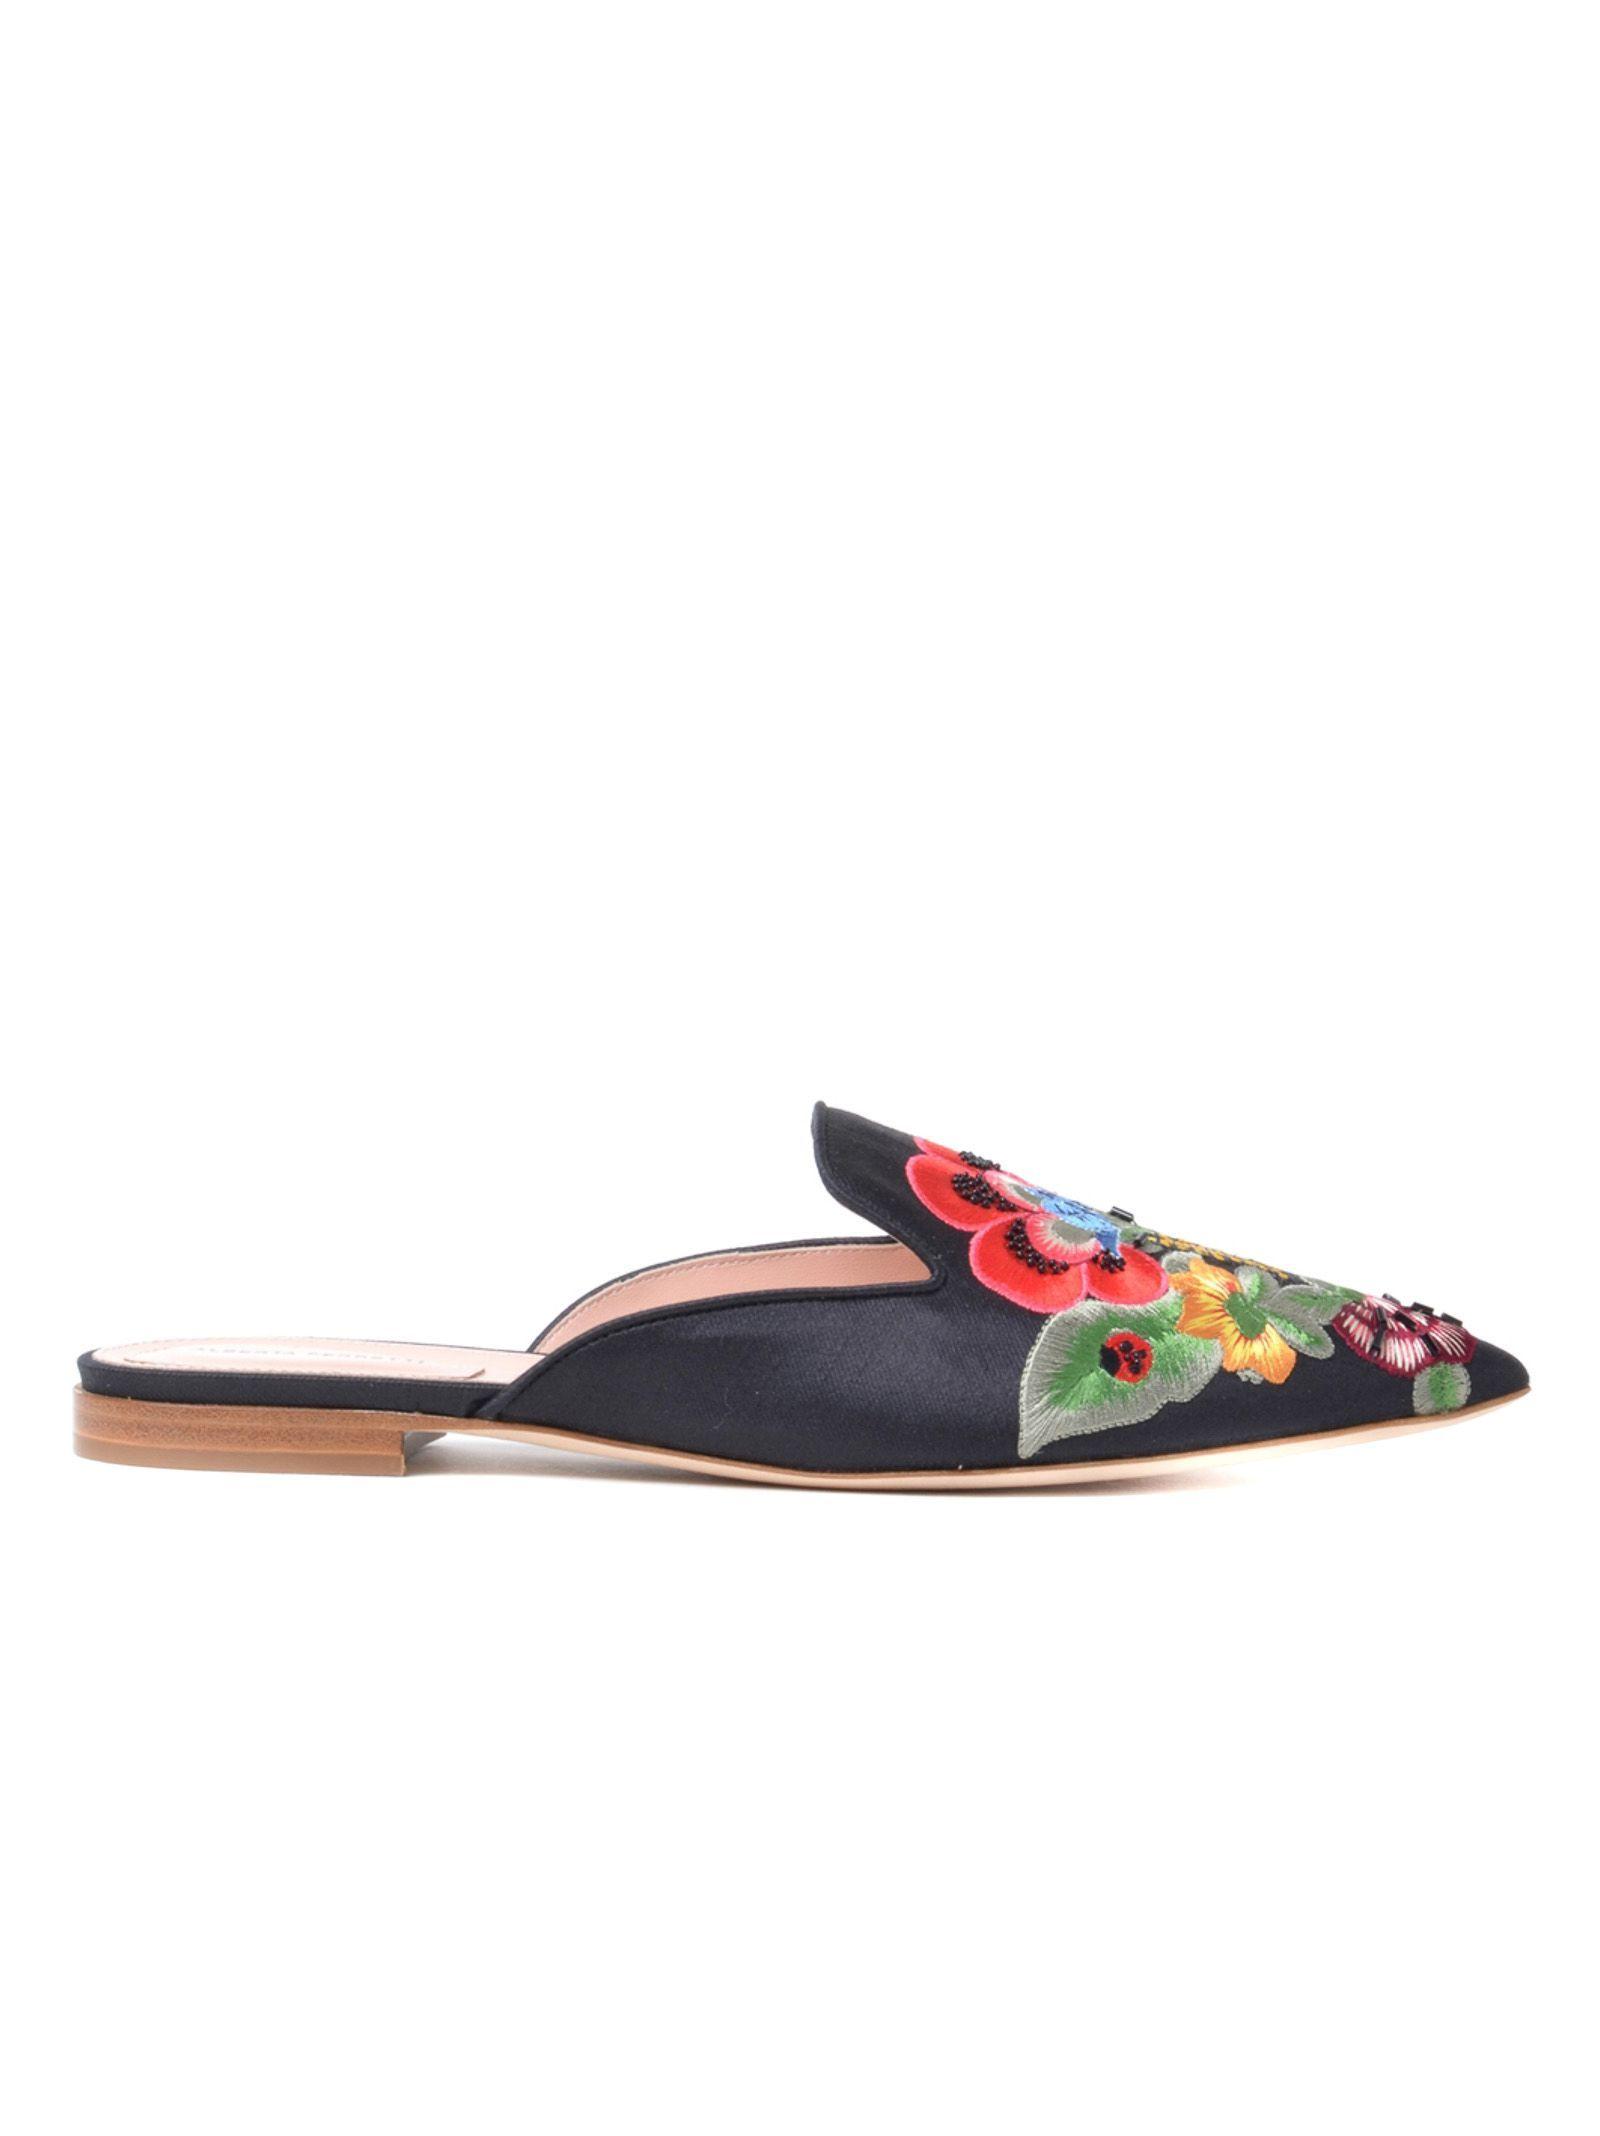 Chaussures En Tissu Alberta De Ferretti dHhKaD